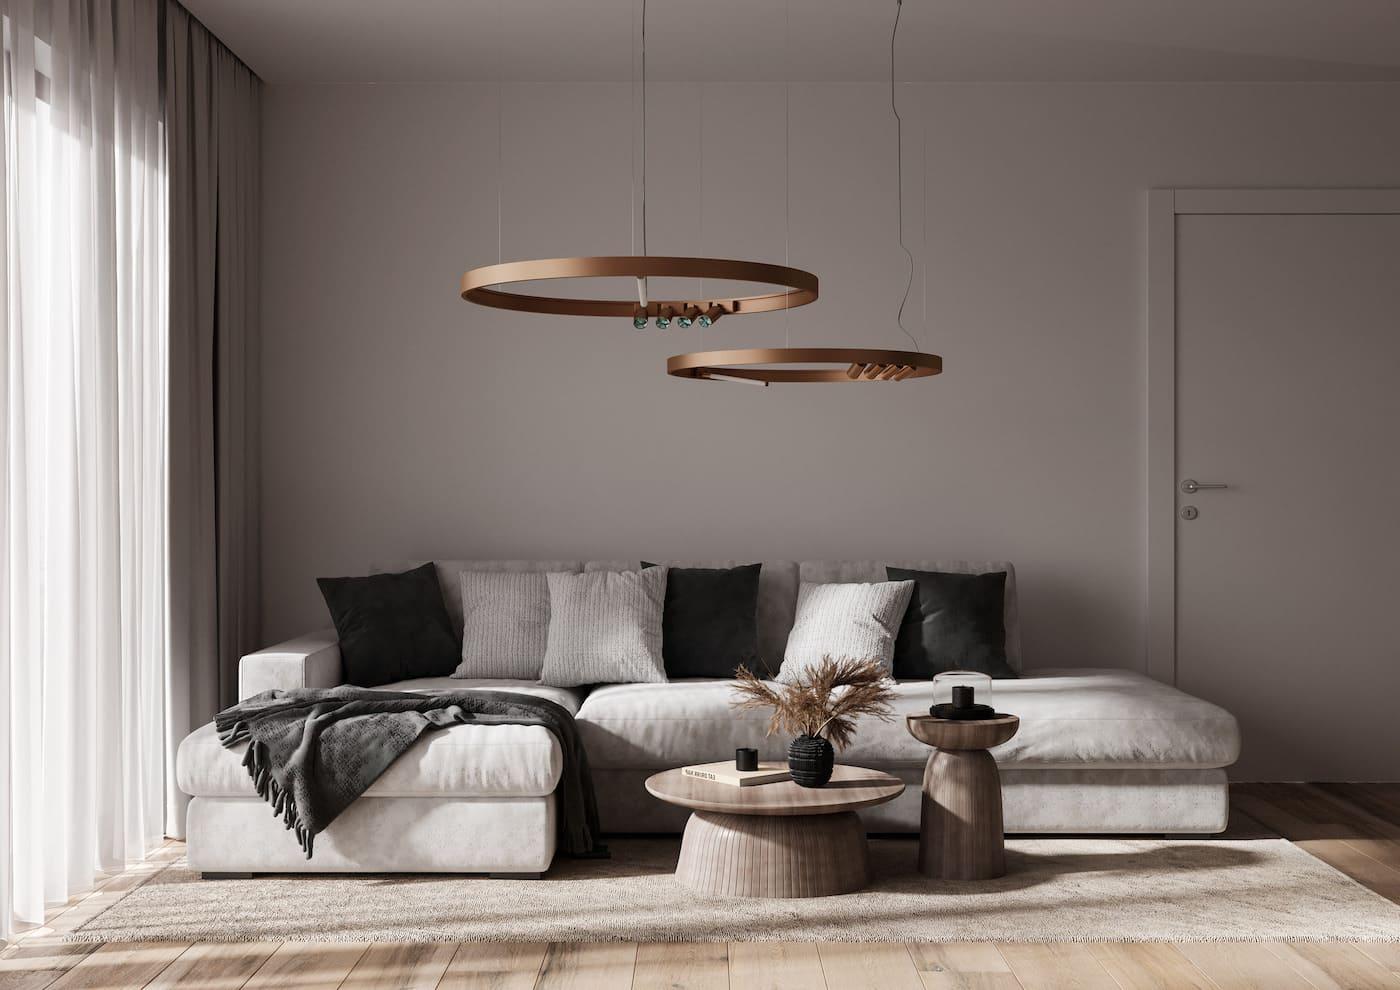 модный дизайн интерьера квартиры фото 64